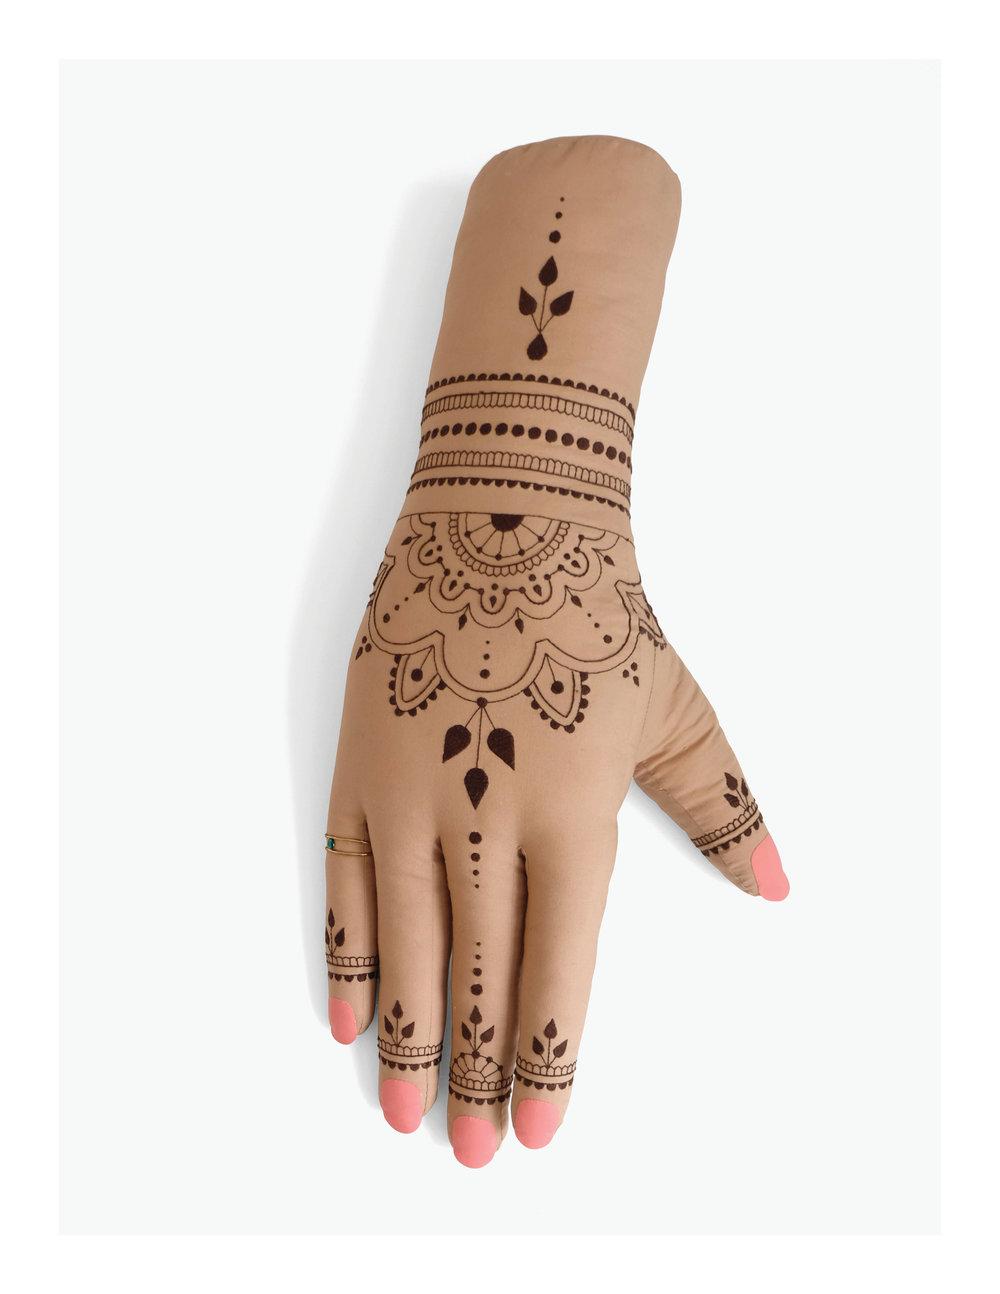 Henna, work in progress  Fiberfill, cotton cloth, embroidery floss, nylon cord, plastic rhinestone 36 x 18 x 6 in 2017